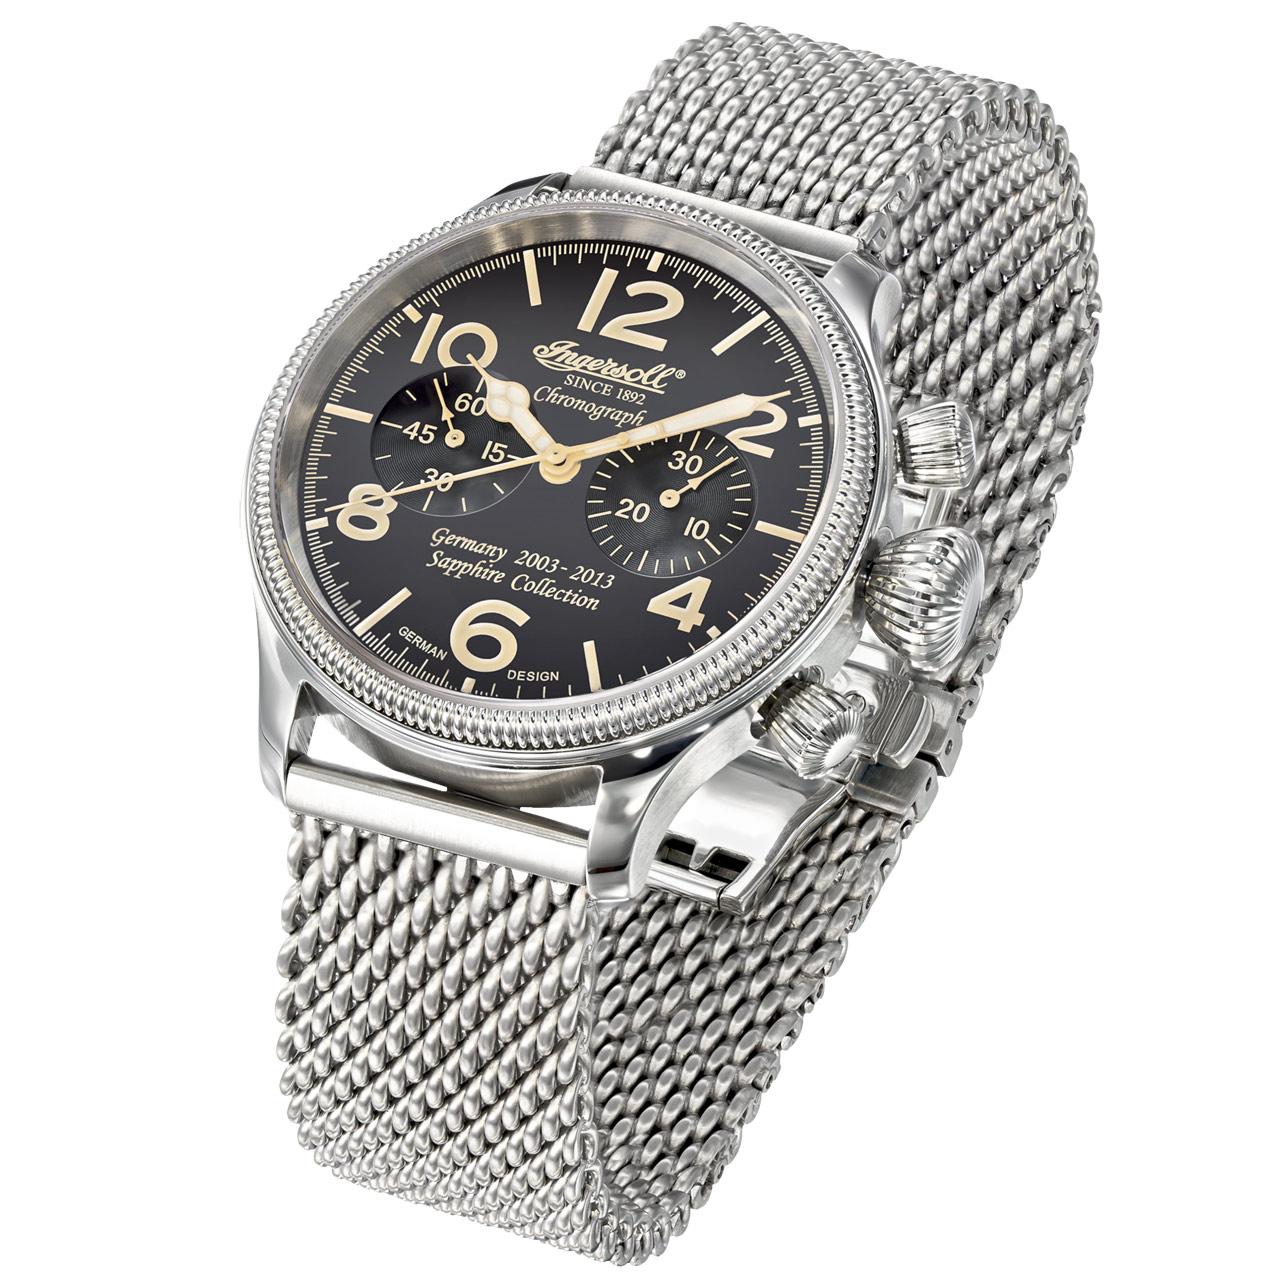 Ingersoll Wells Fargo III IN4610BKMB Herren Armbanduhr Handaufzug Chronograph